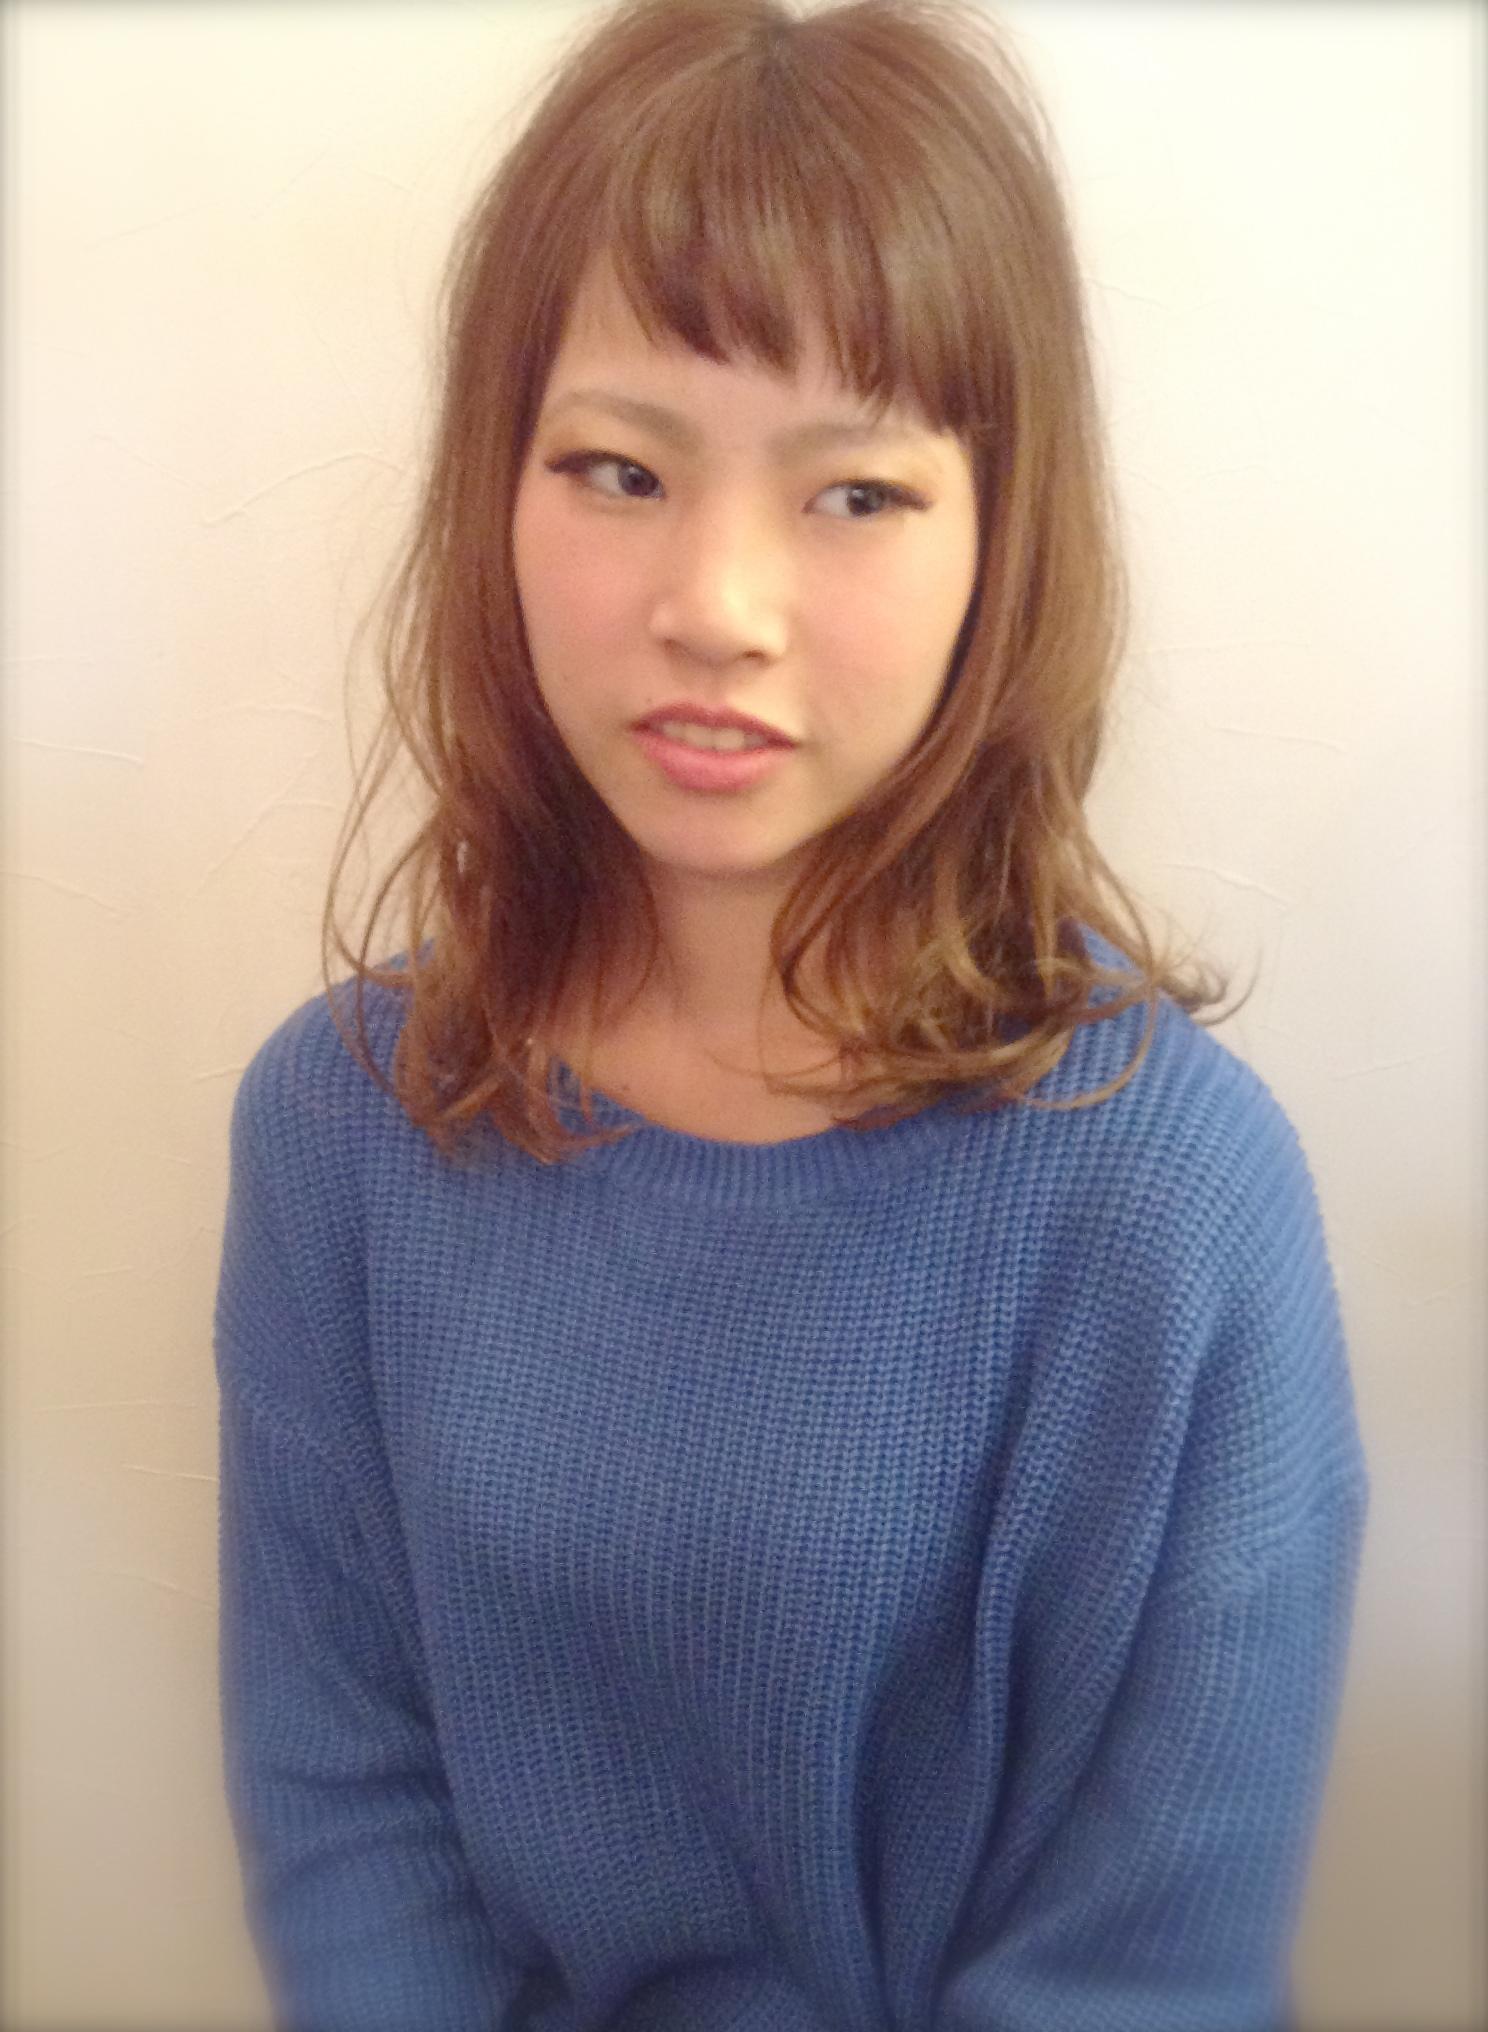 image-76.jpg